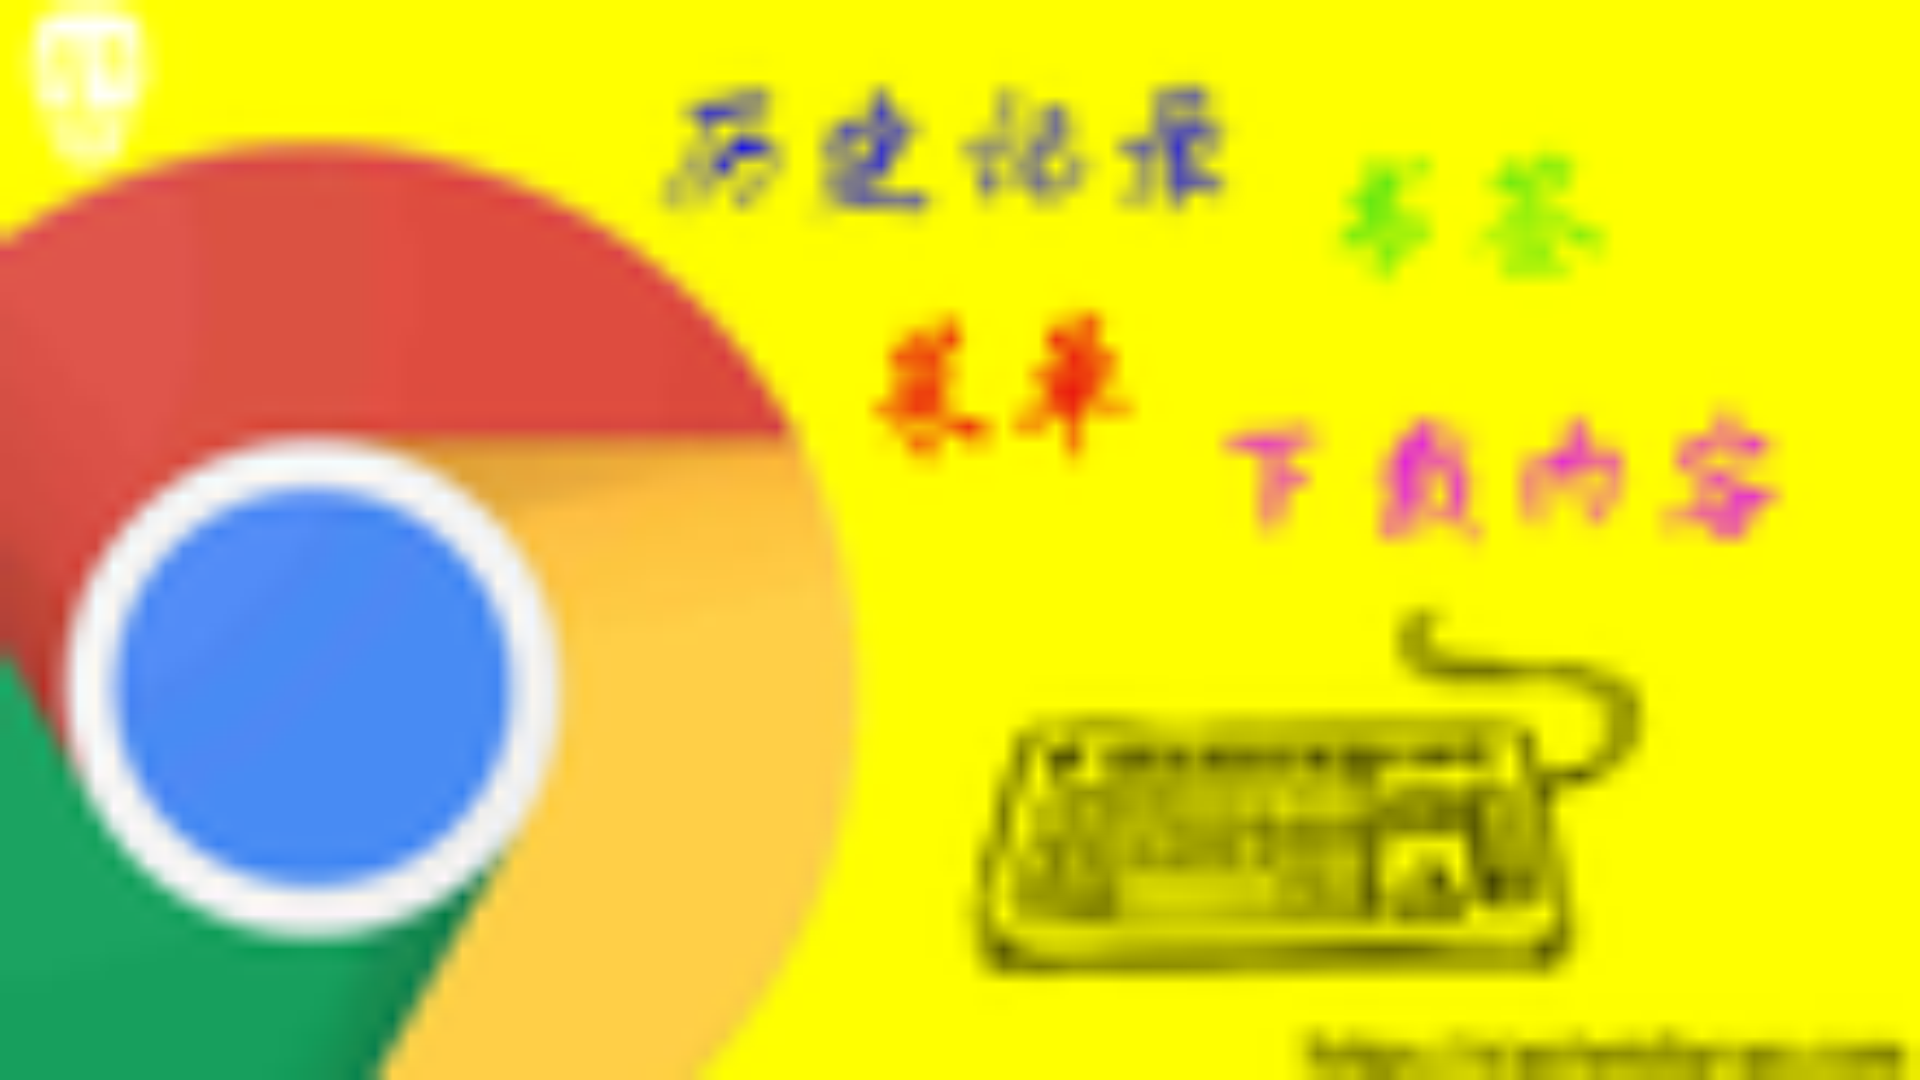 【Chrome浏览器】功能性快捷键-高效使用Chrome浏览器的功能